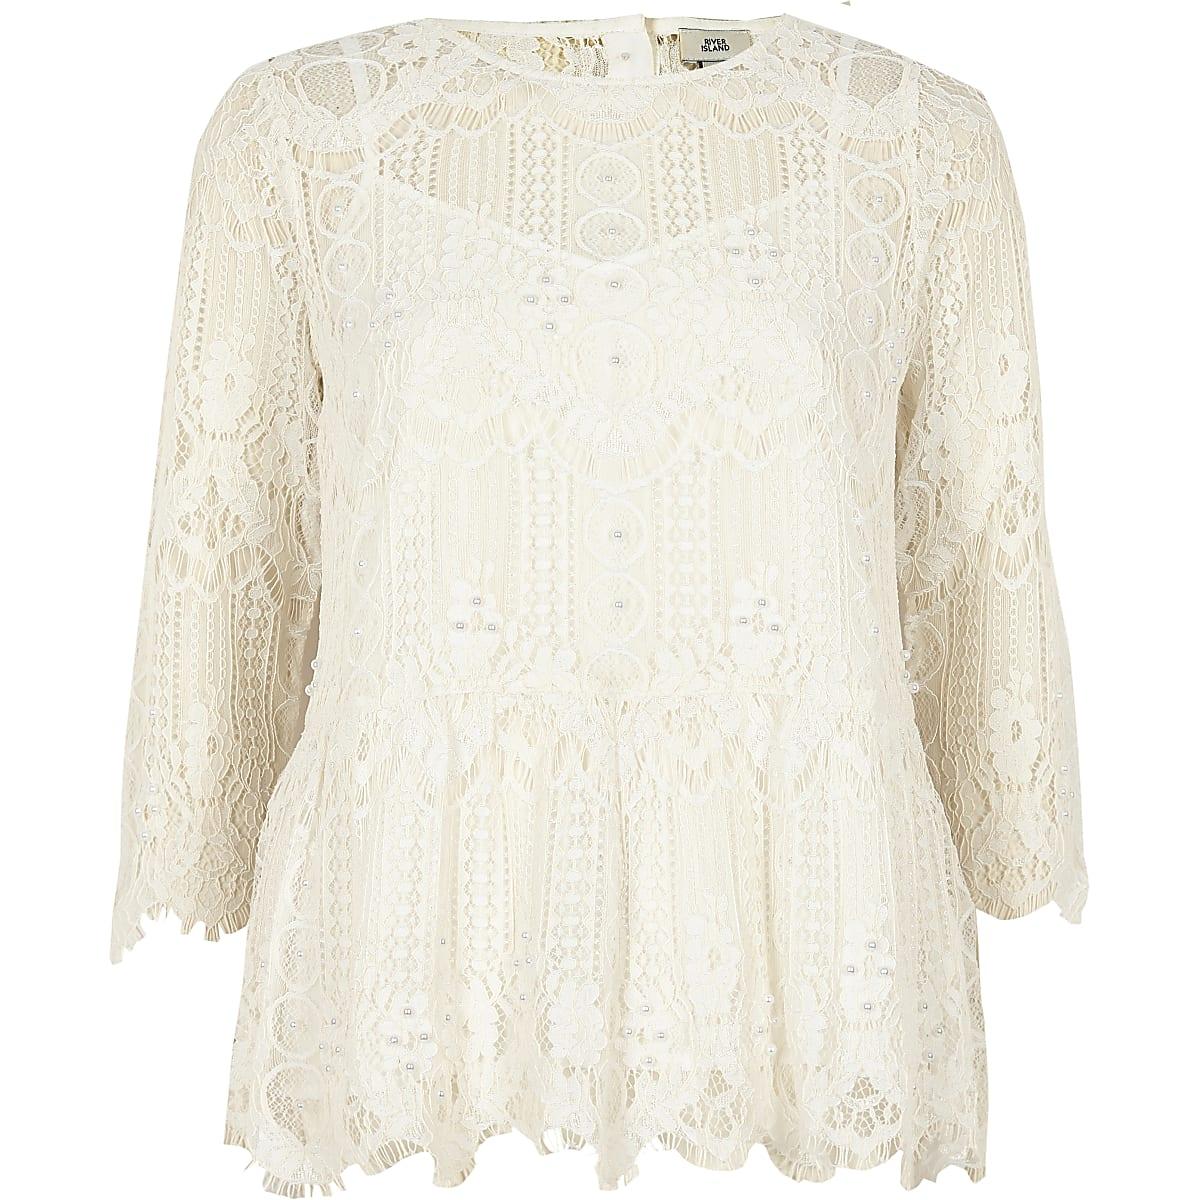 1ff5b32e9b3c6c Cream lace pearl embellished peplum top - Peplum Tops - Tops - women